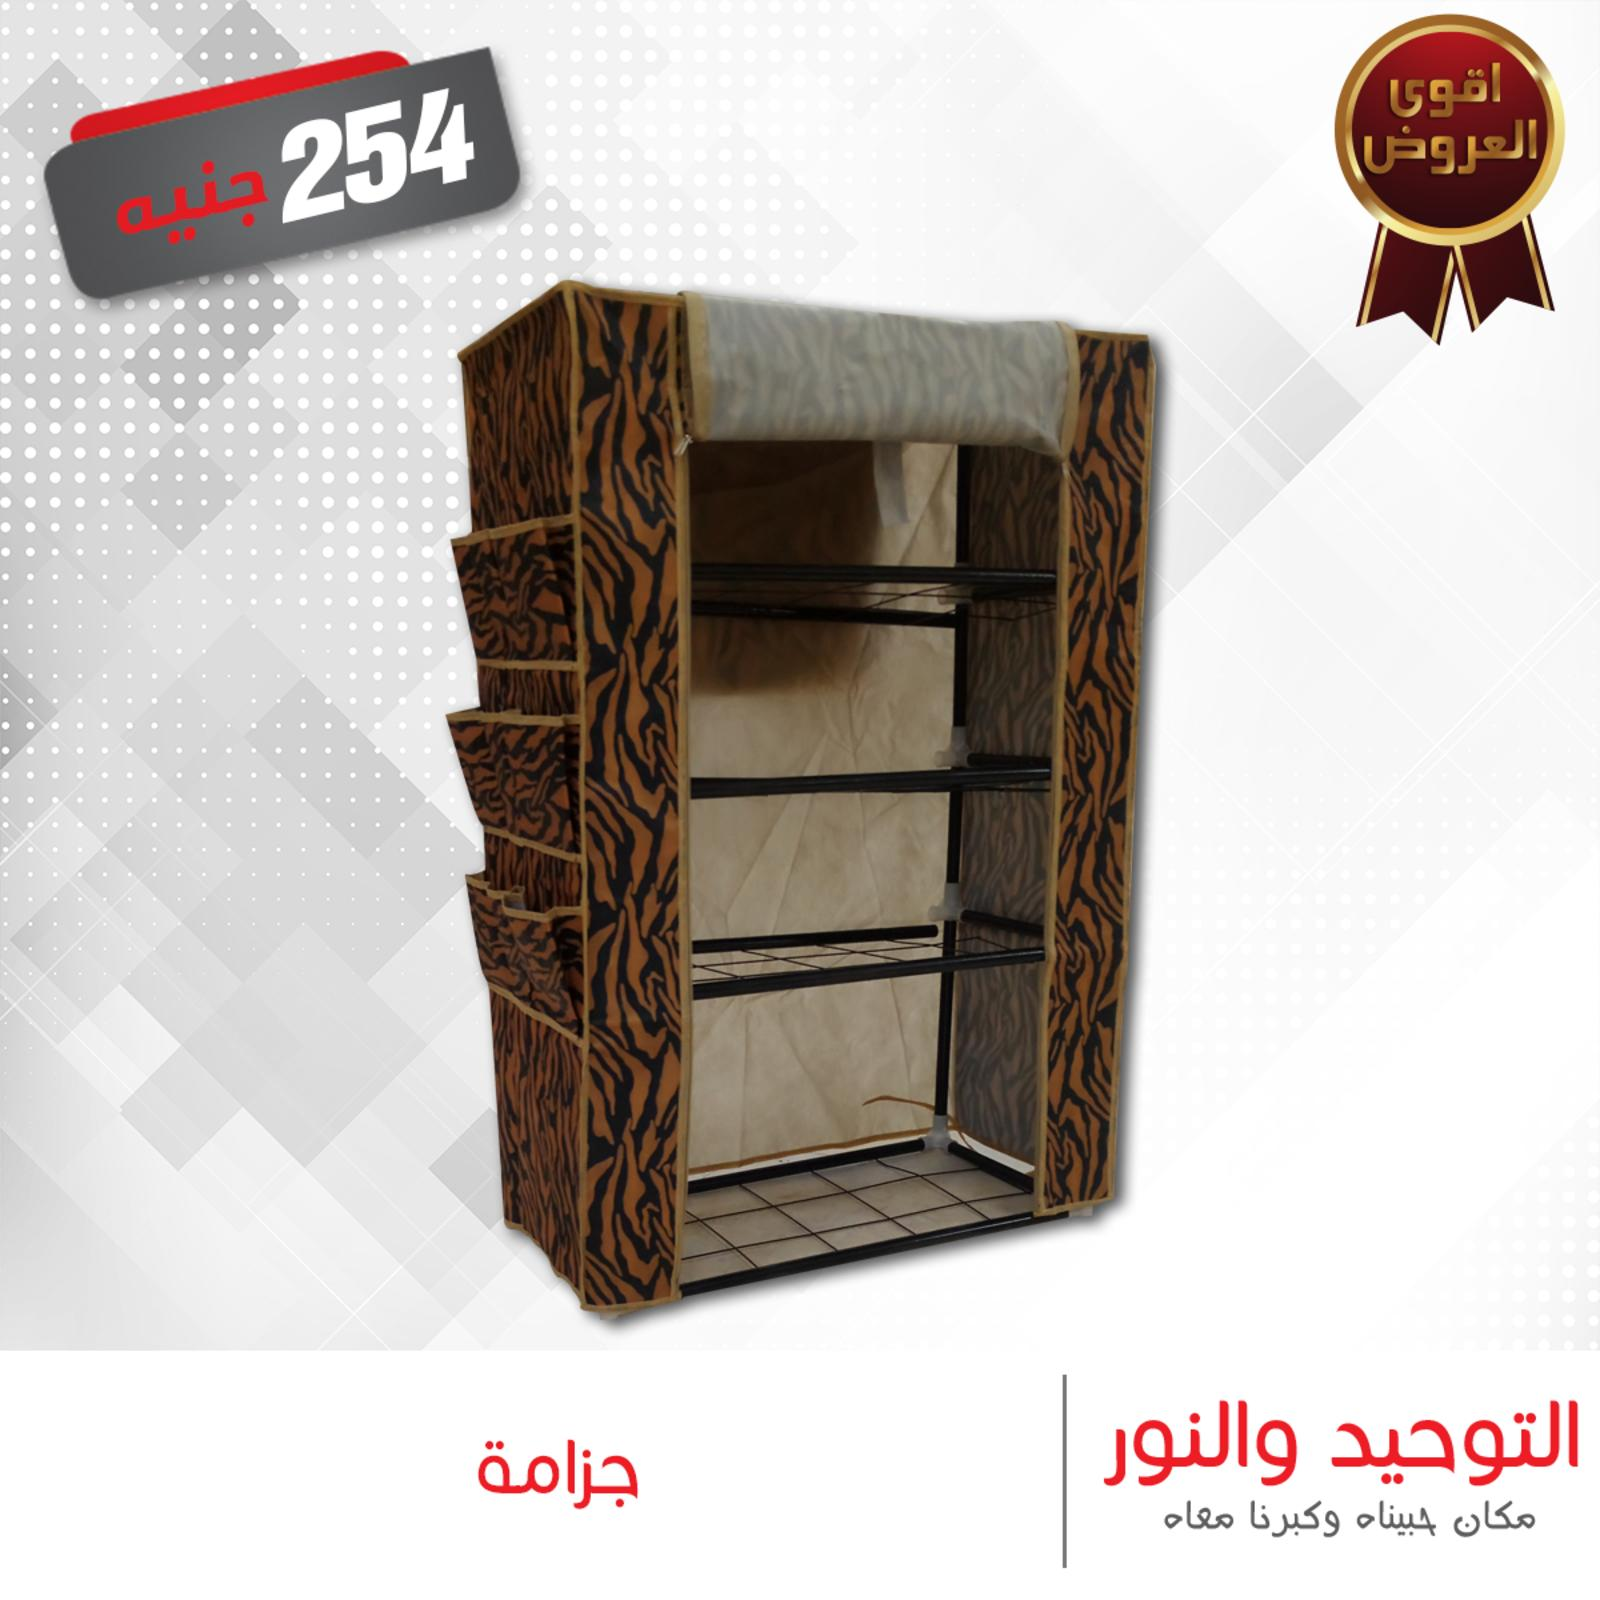 اثاث التوحيد والنور from p.calameoassets.com